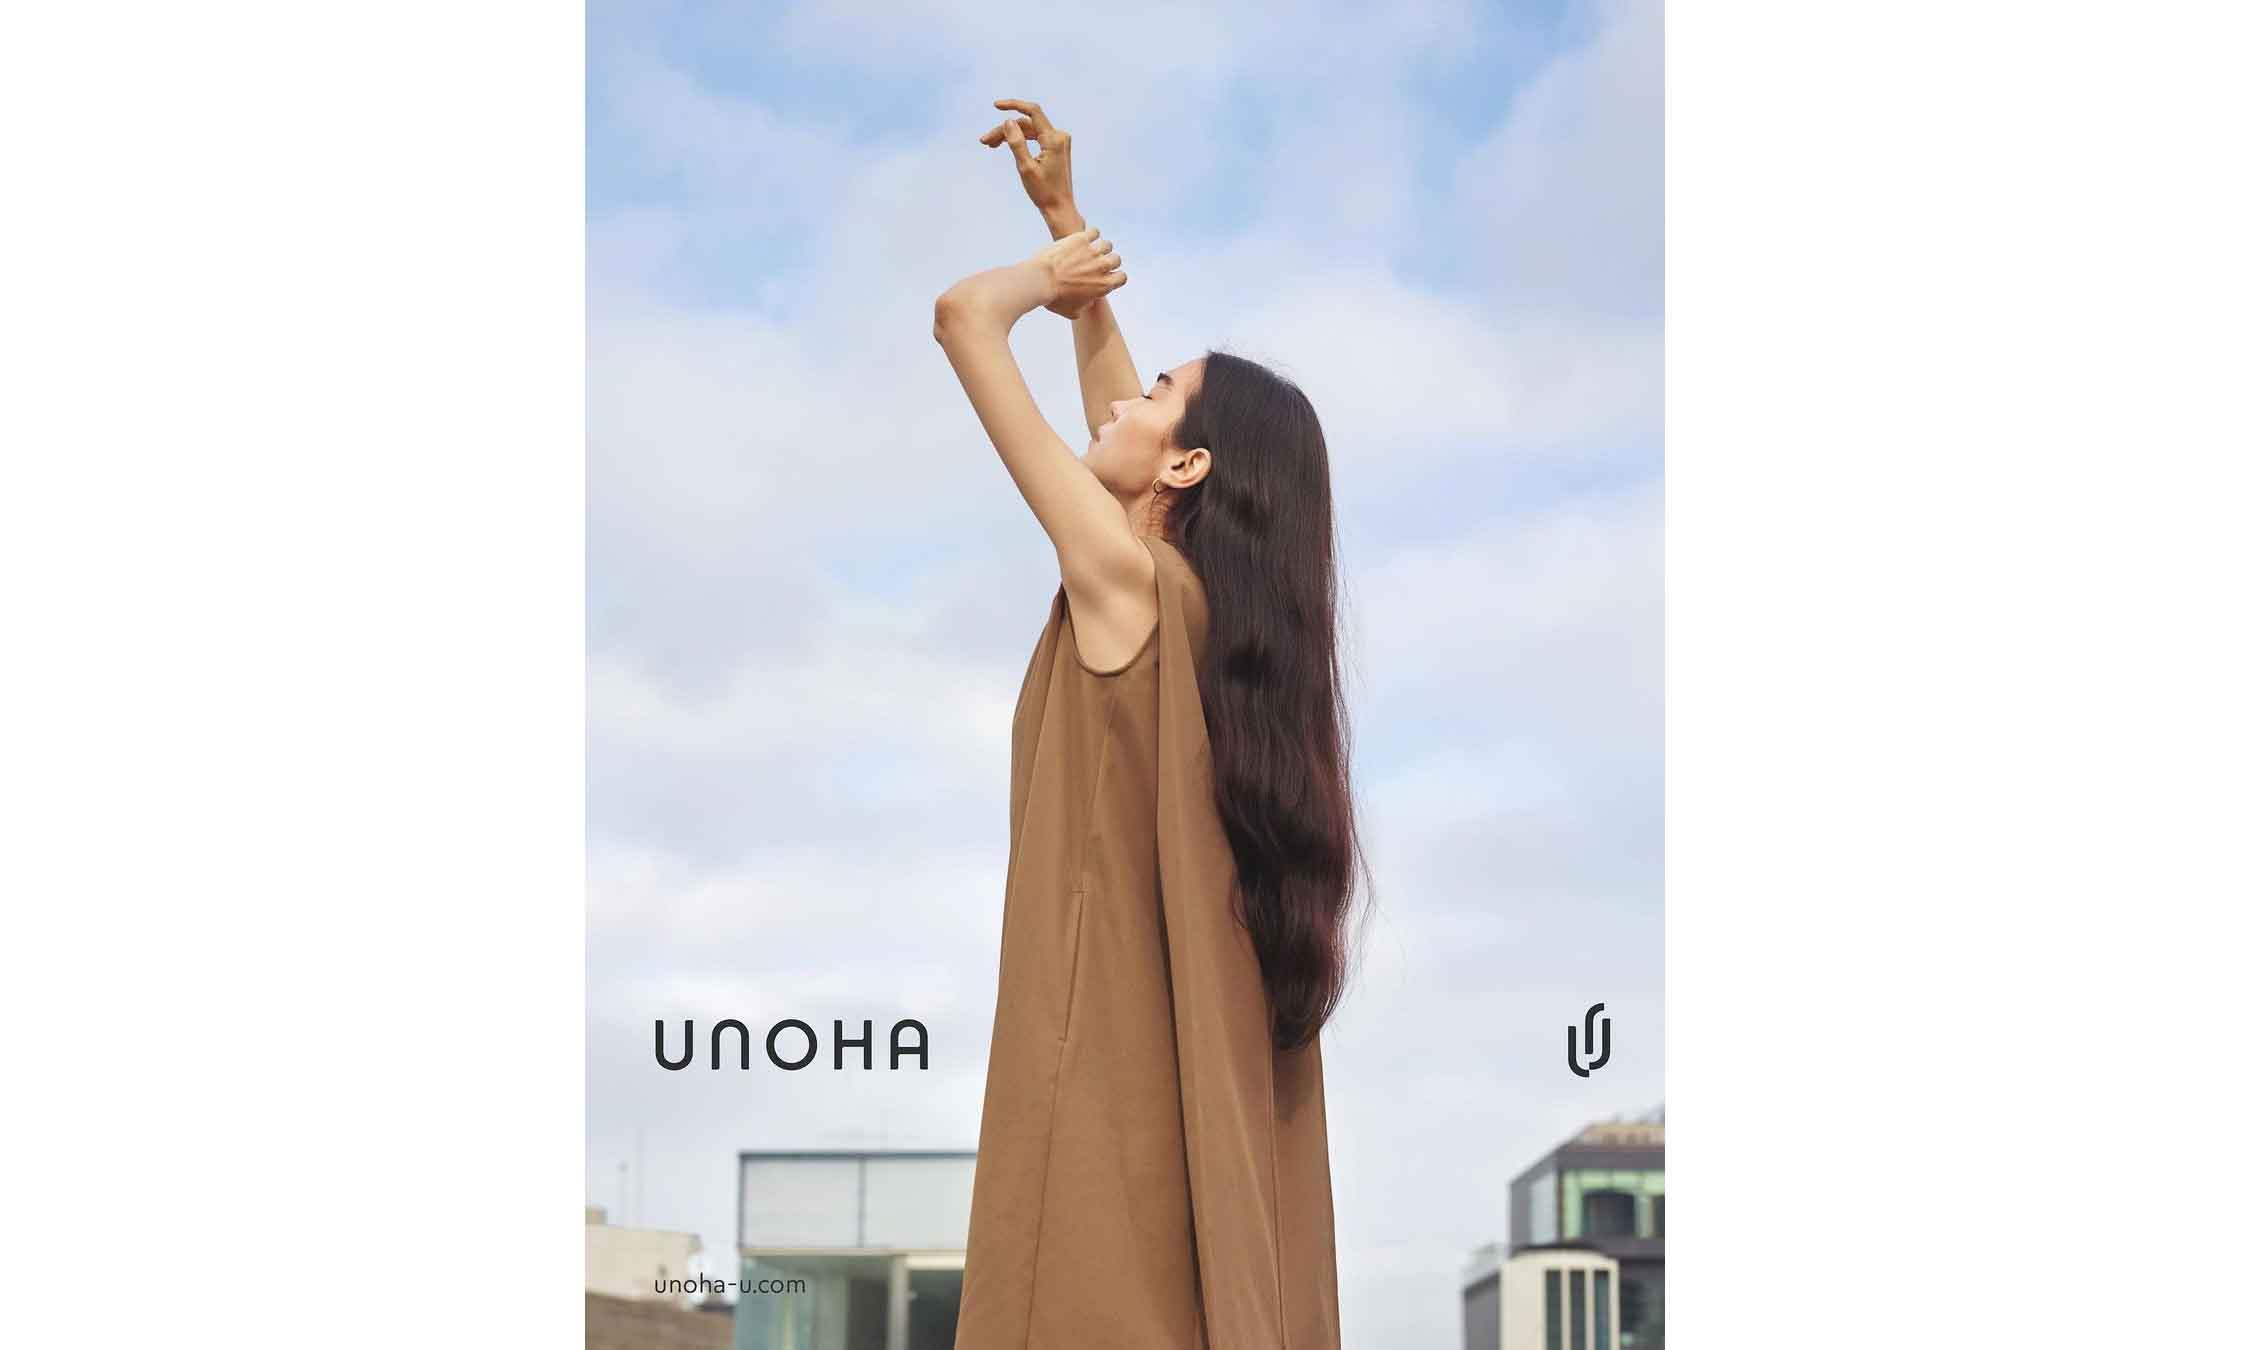 ASICS 推出全新生活方式品牌 UNOHA